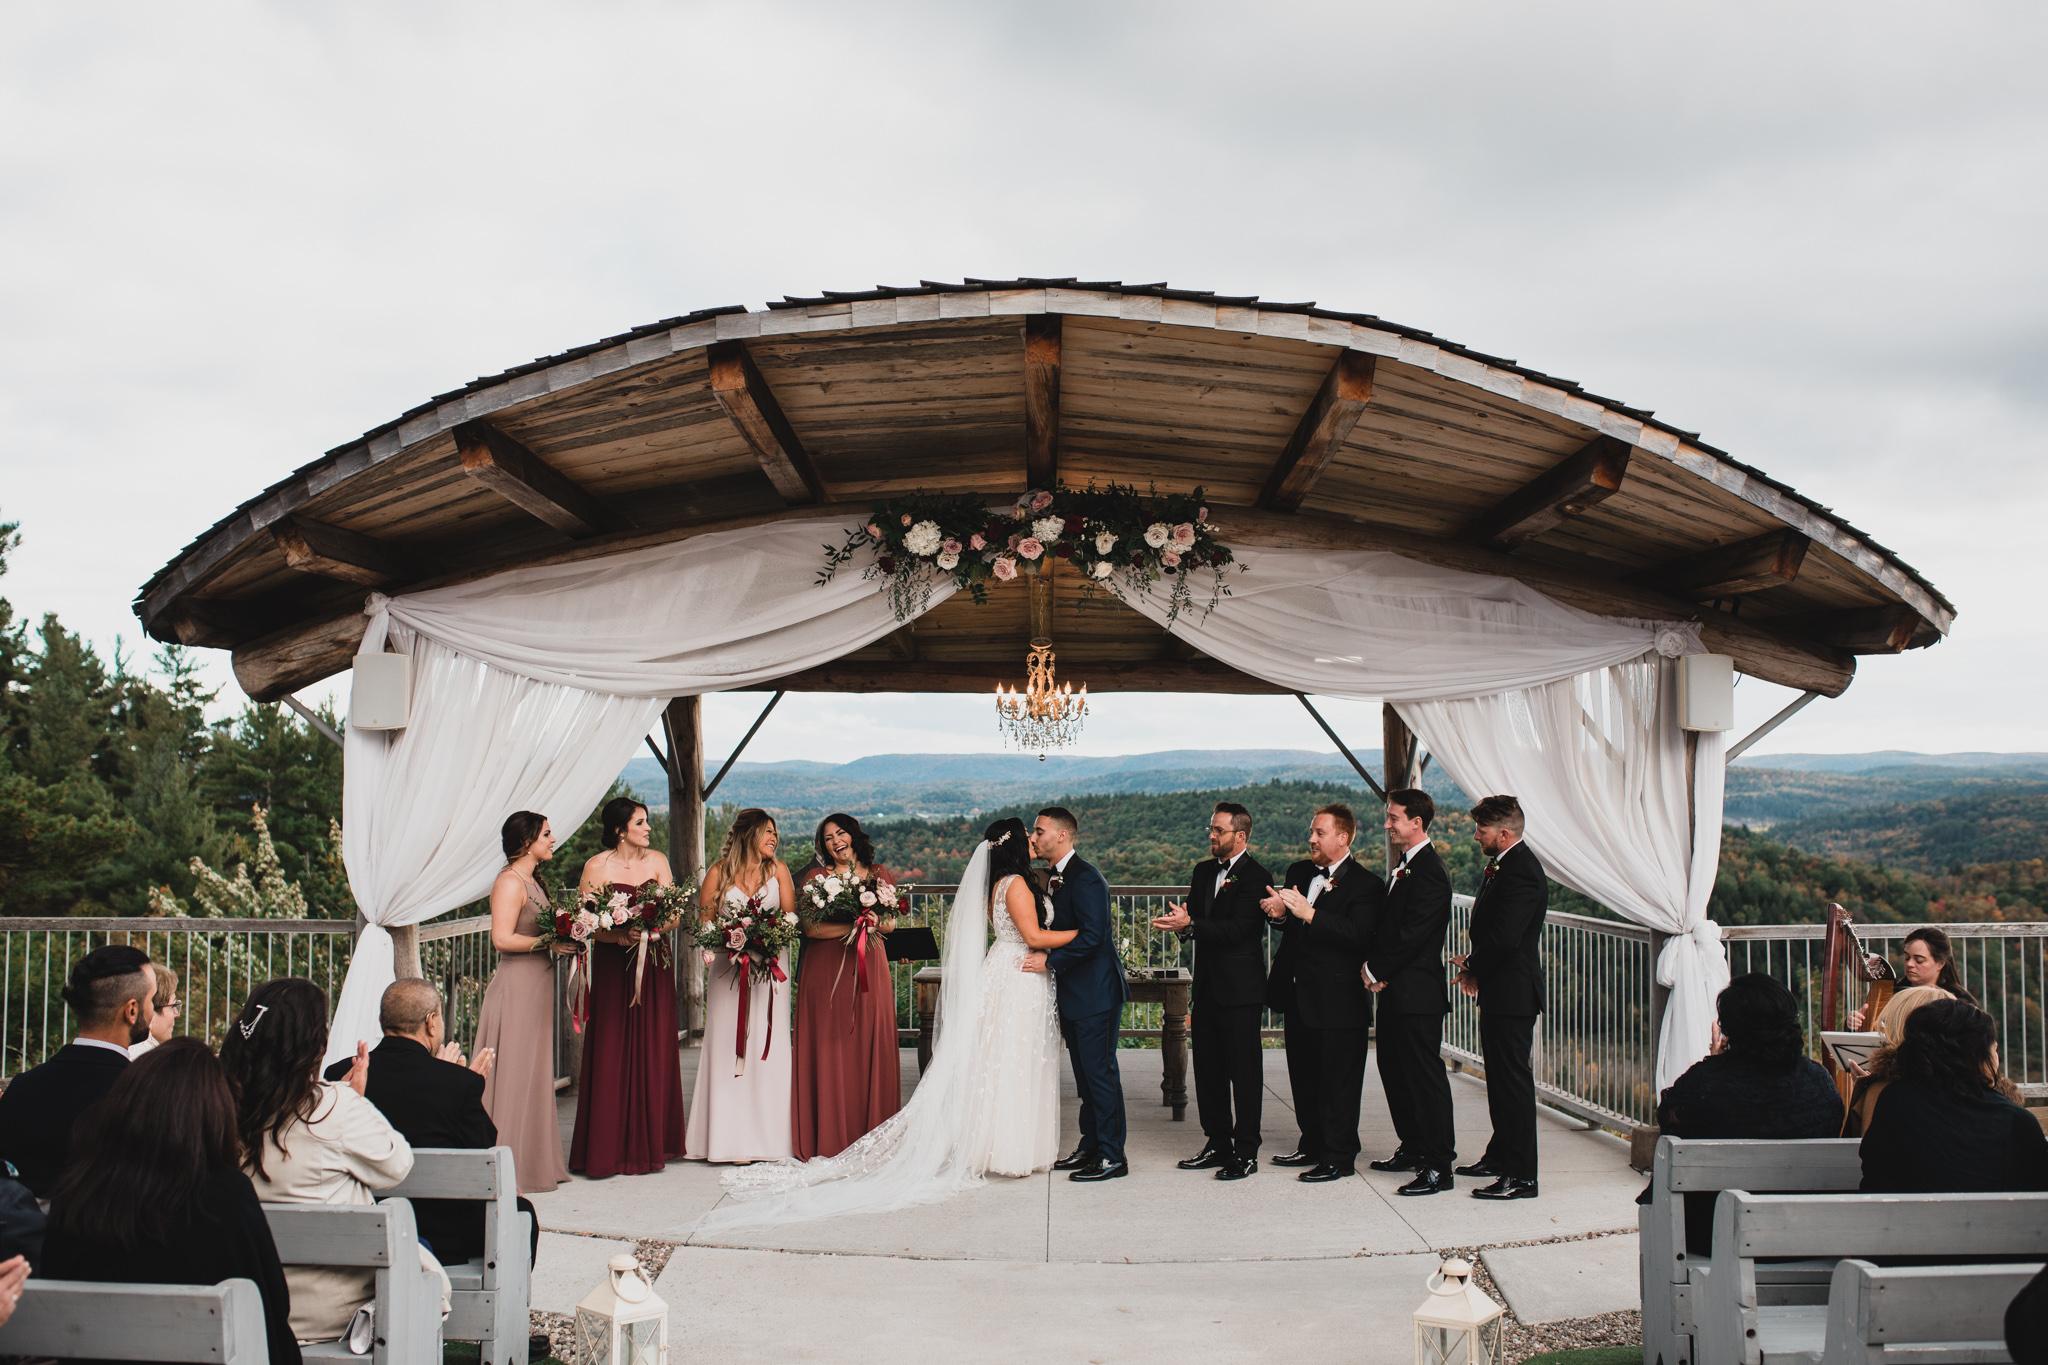 Frid events wedding planning